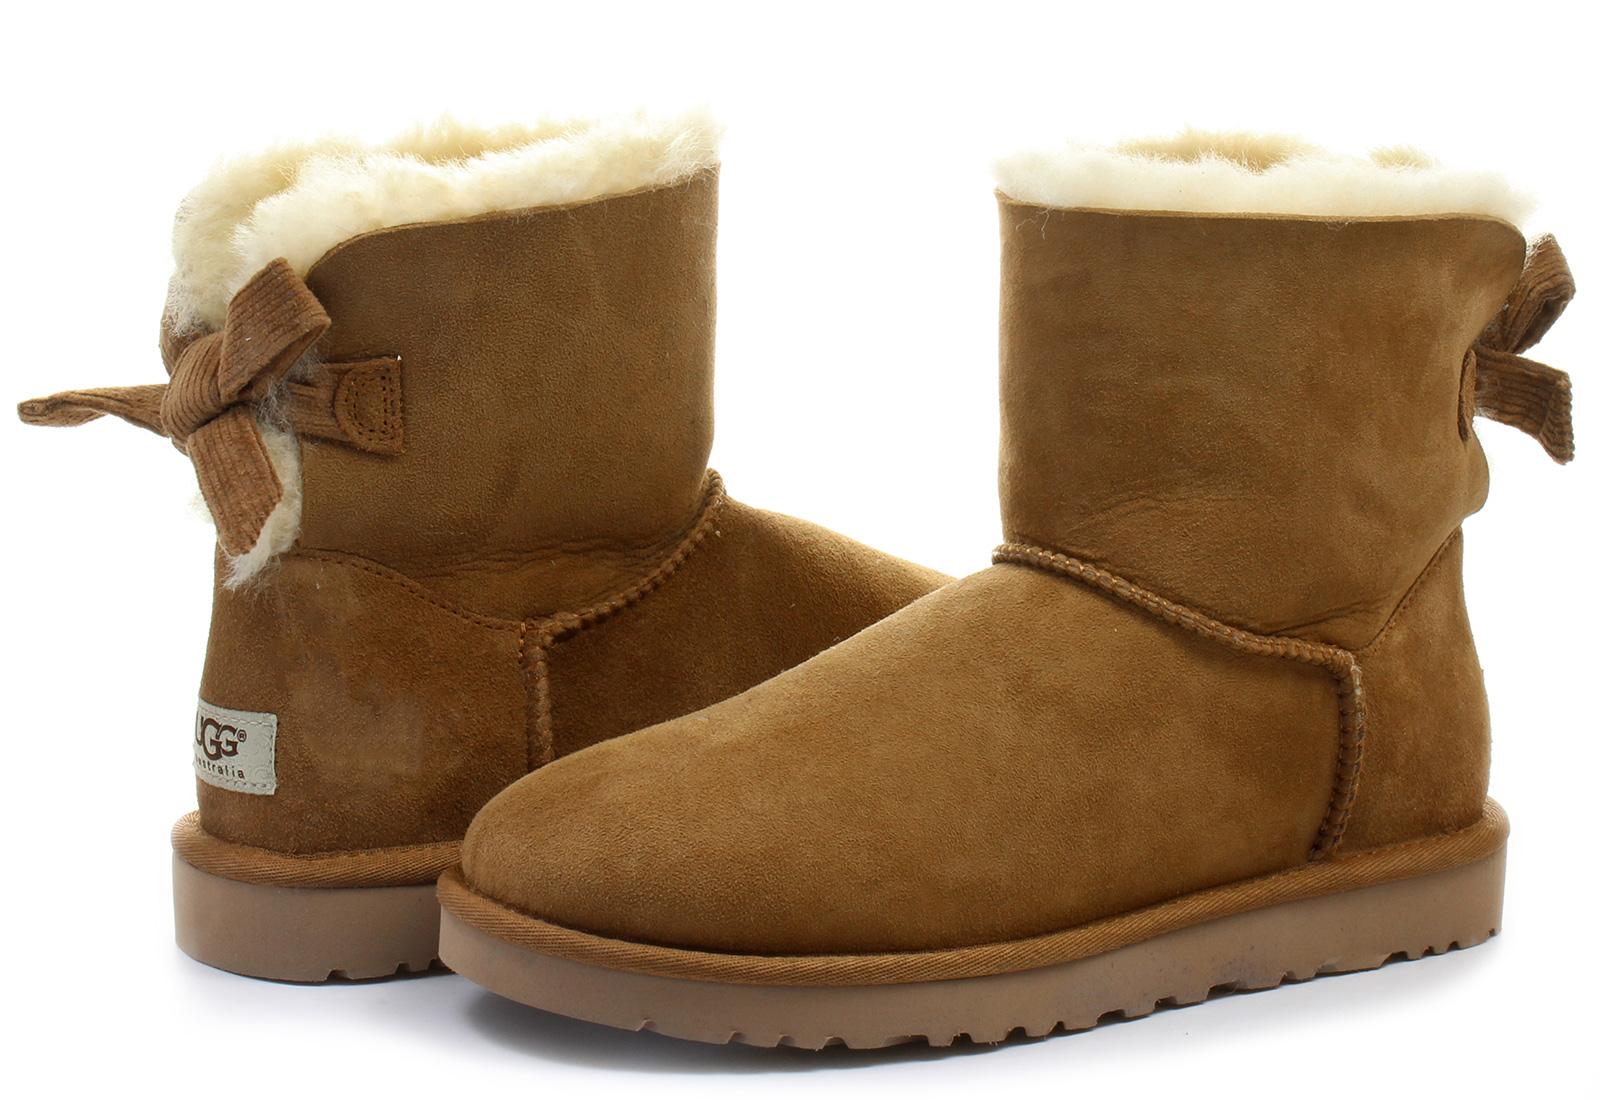 Ugg Csizma - W Mini Bailey Bow Corduroy - 1006057-CHE - Office Shoes ... 00b0043d19